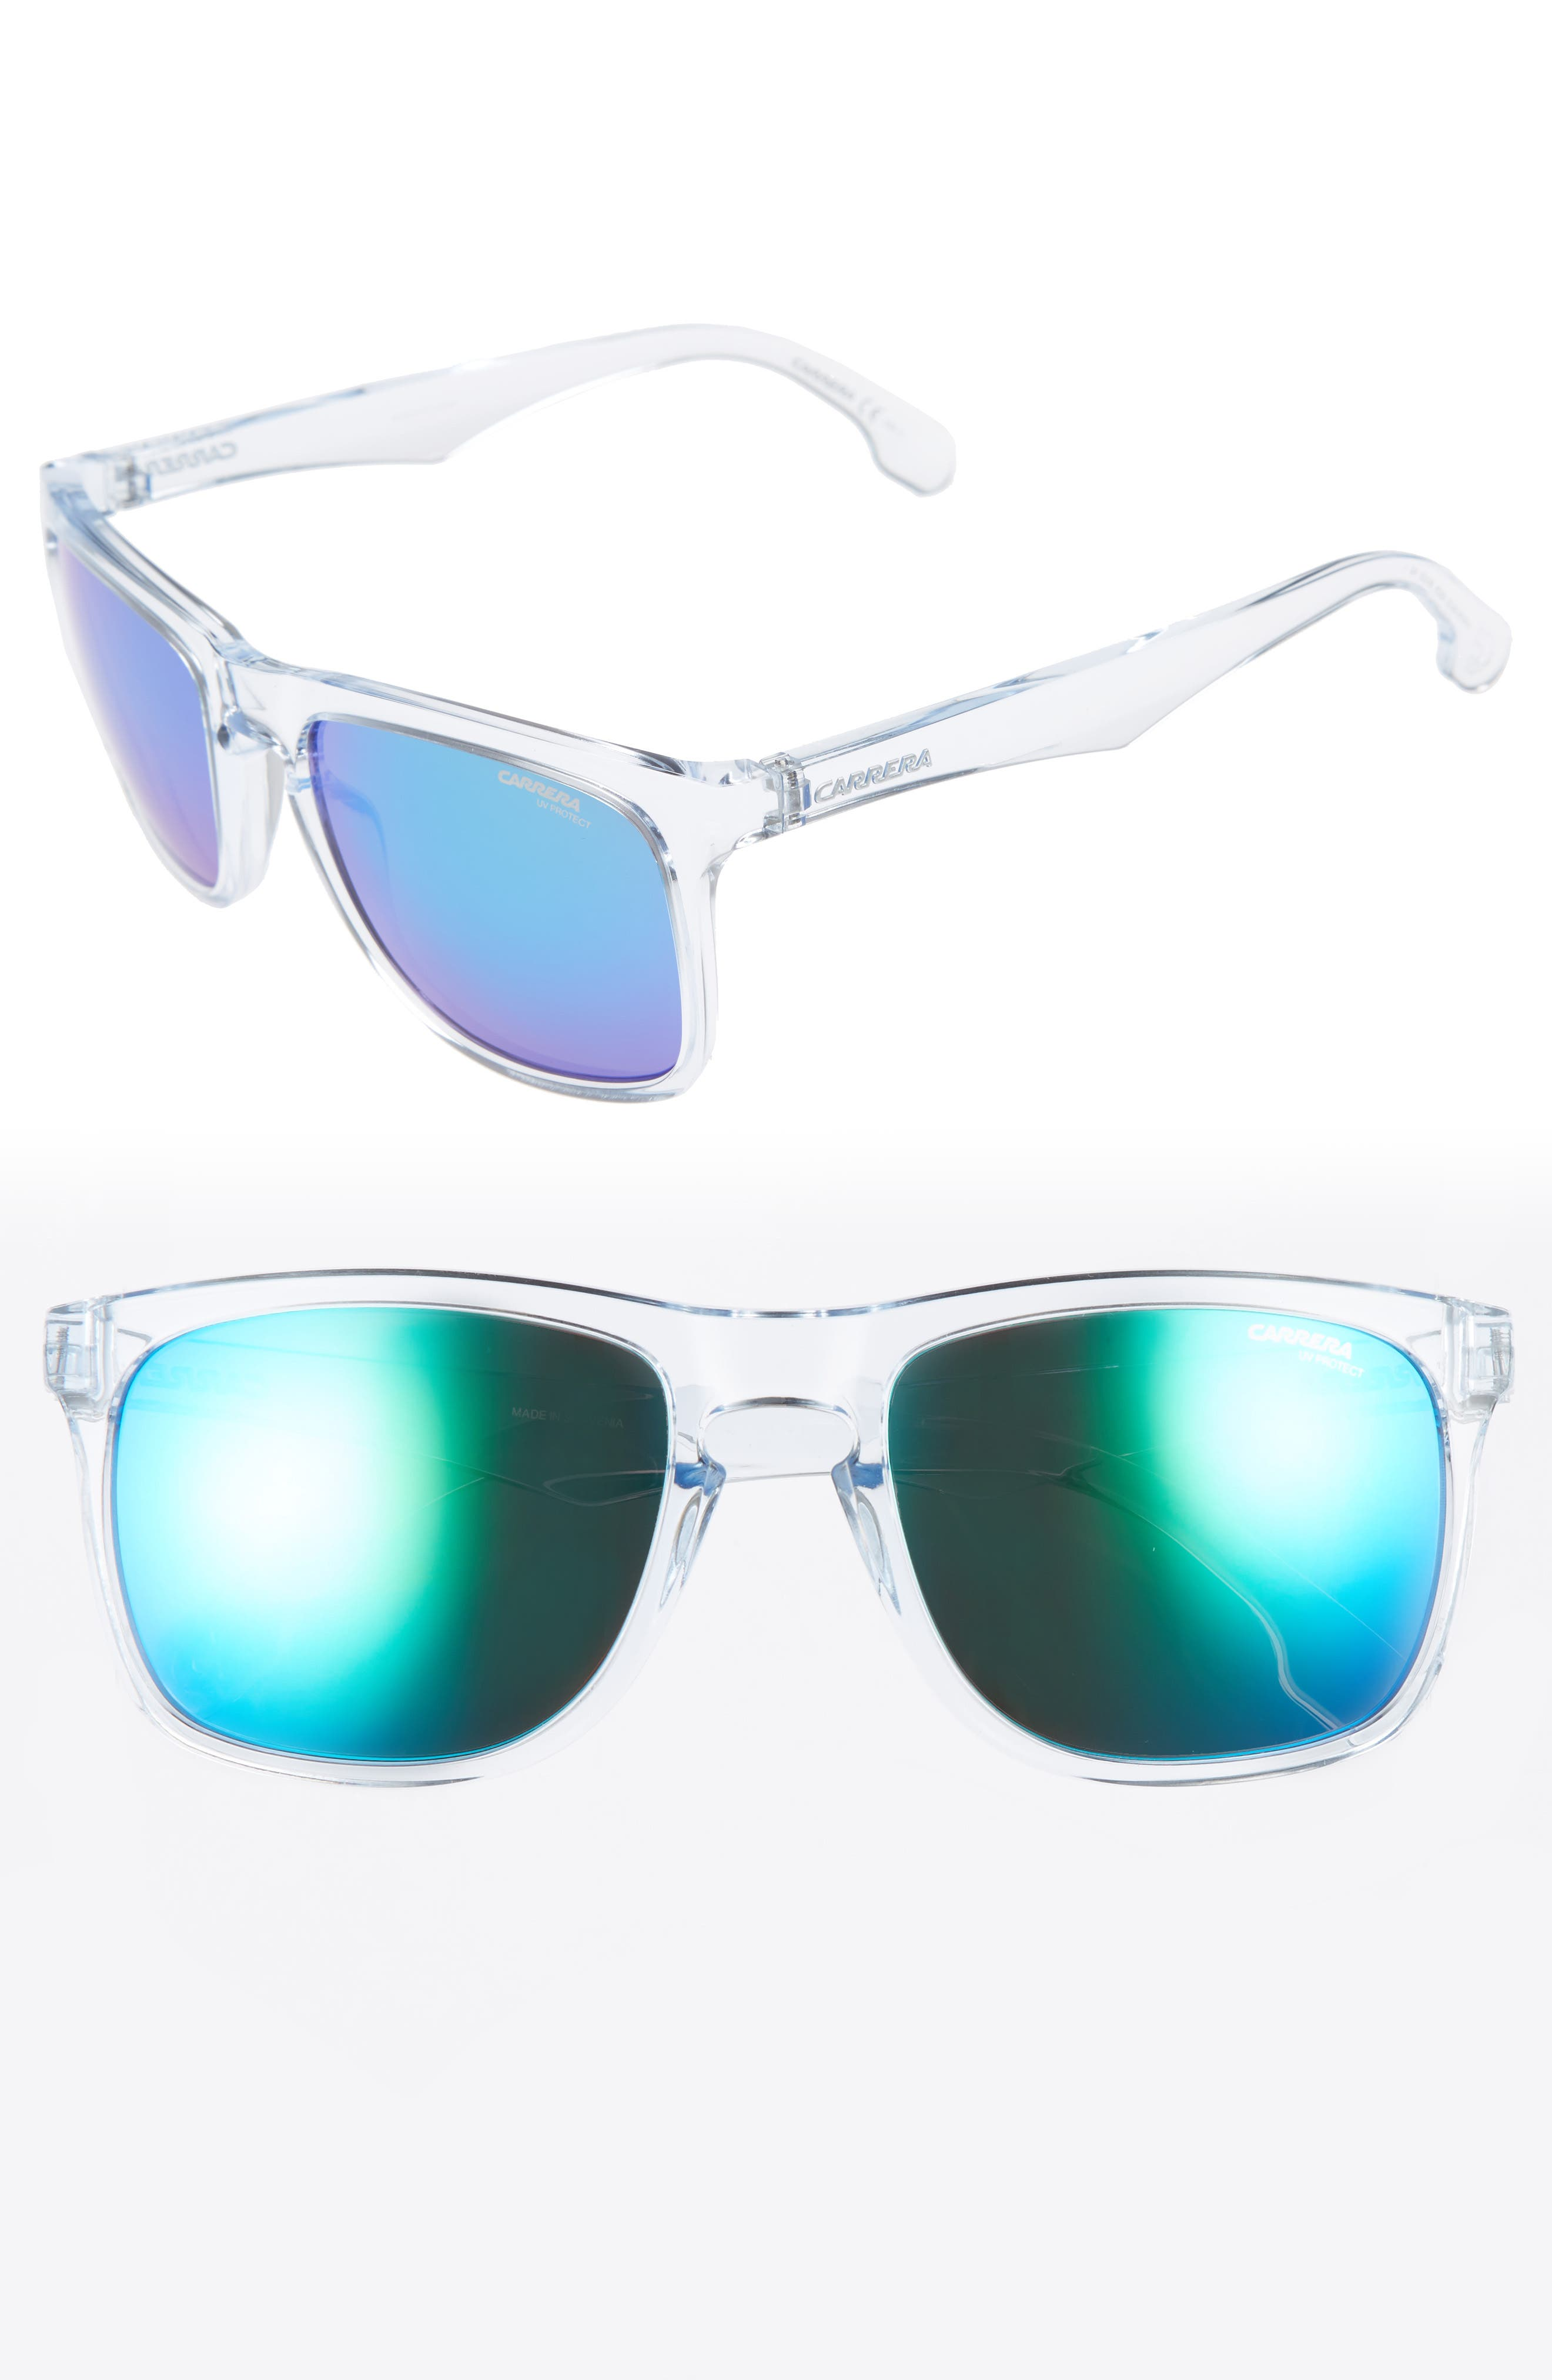 Carrera Eyewear 56mm Mirrored Lens Sunglasses